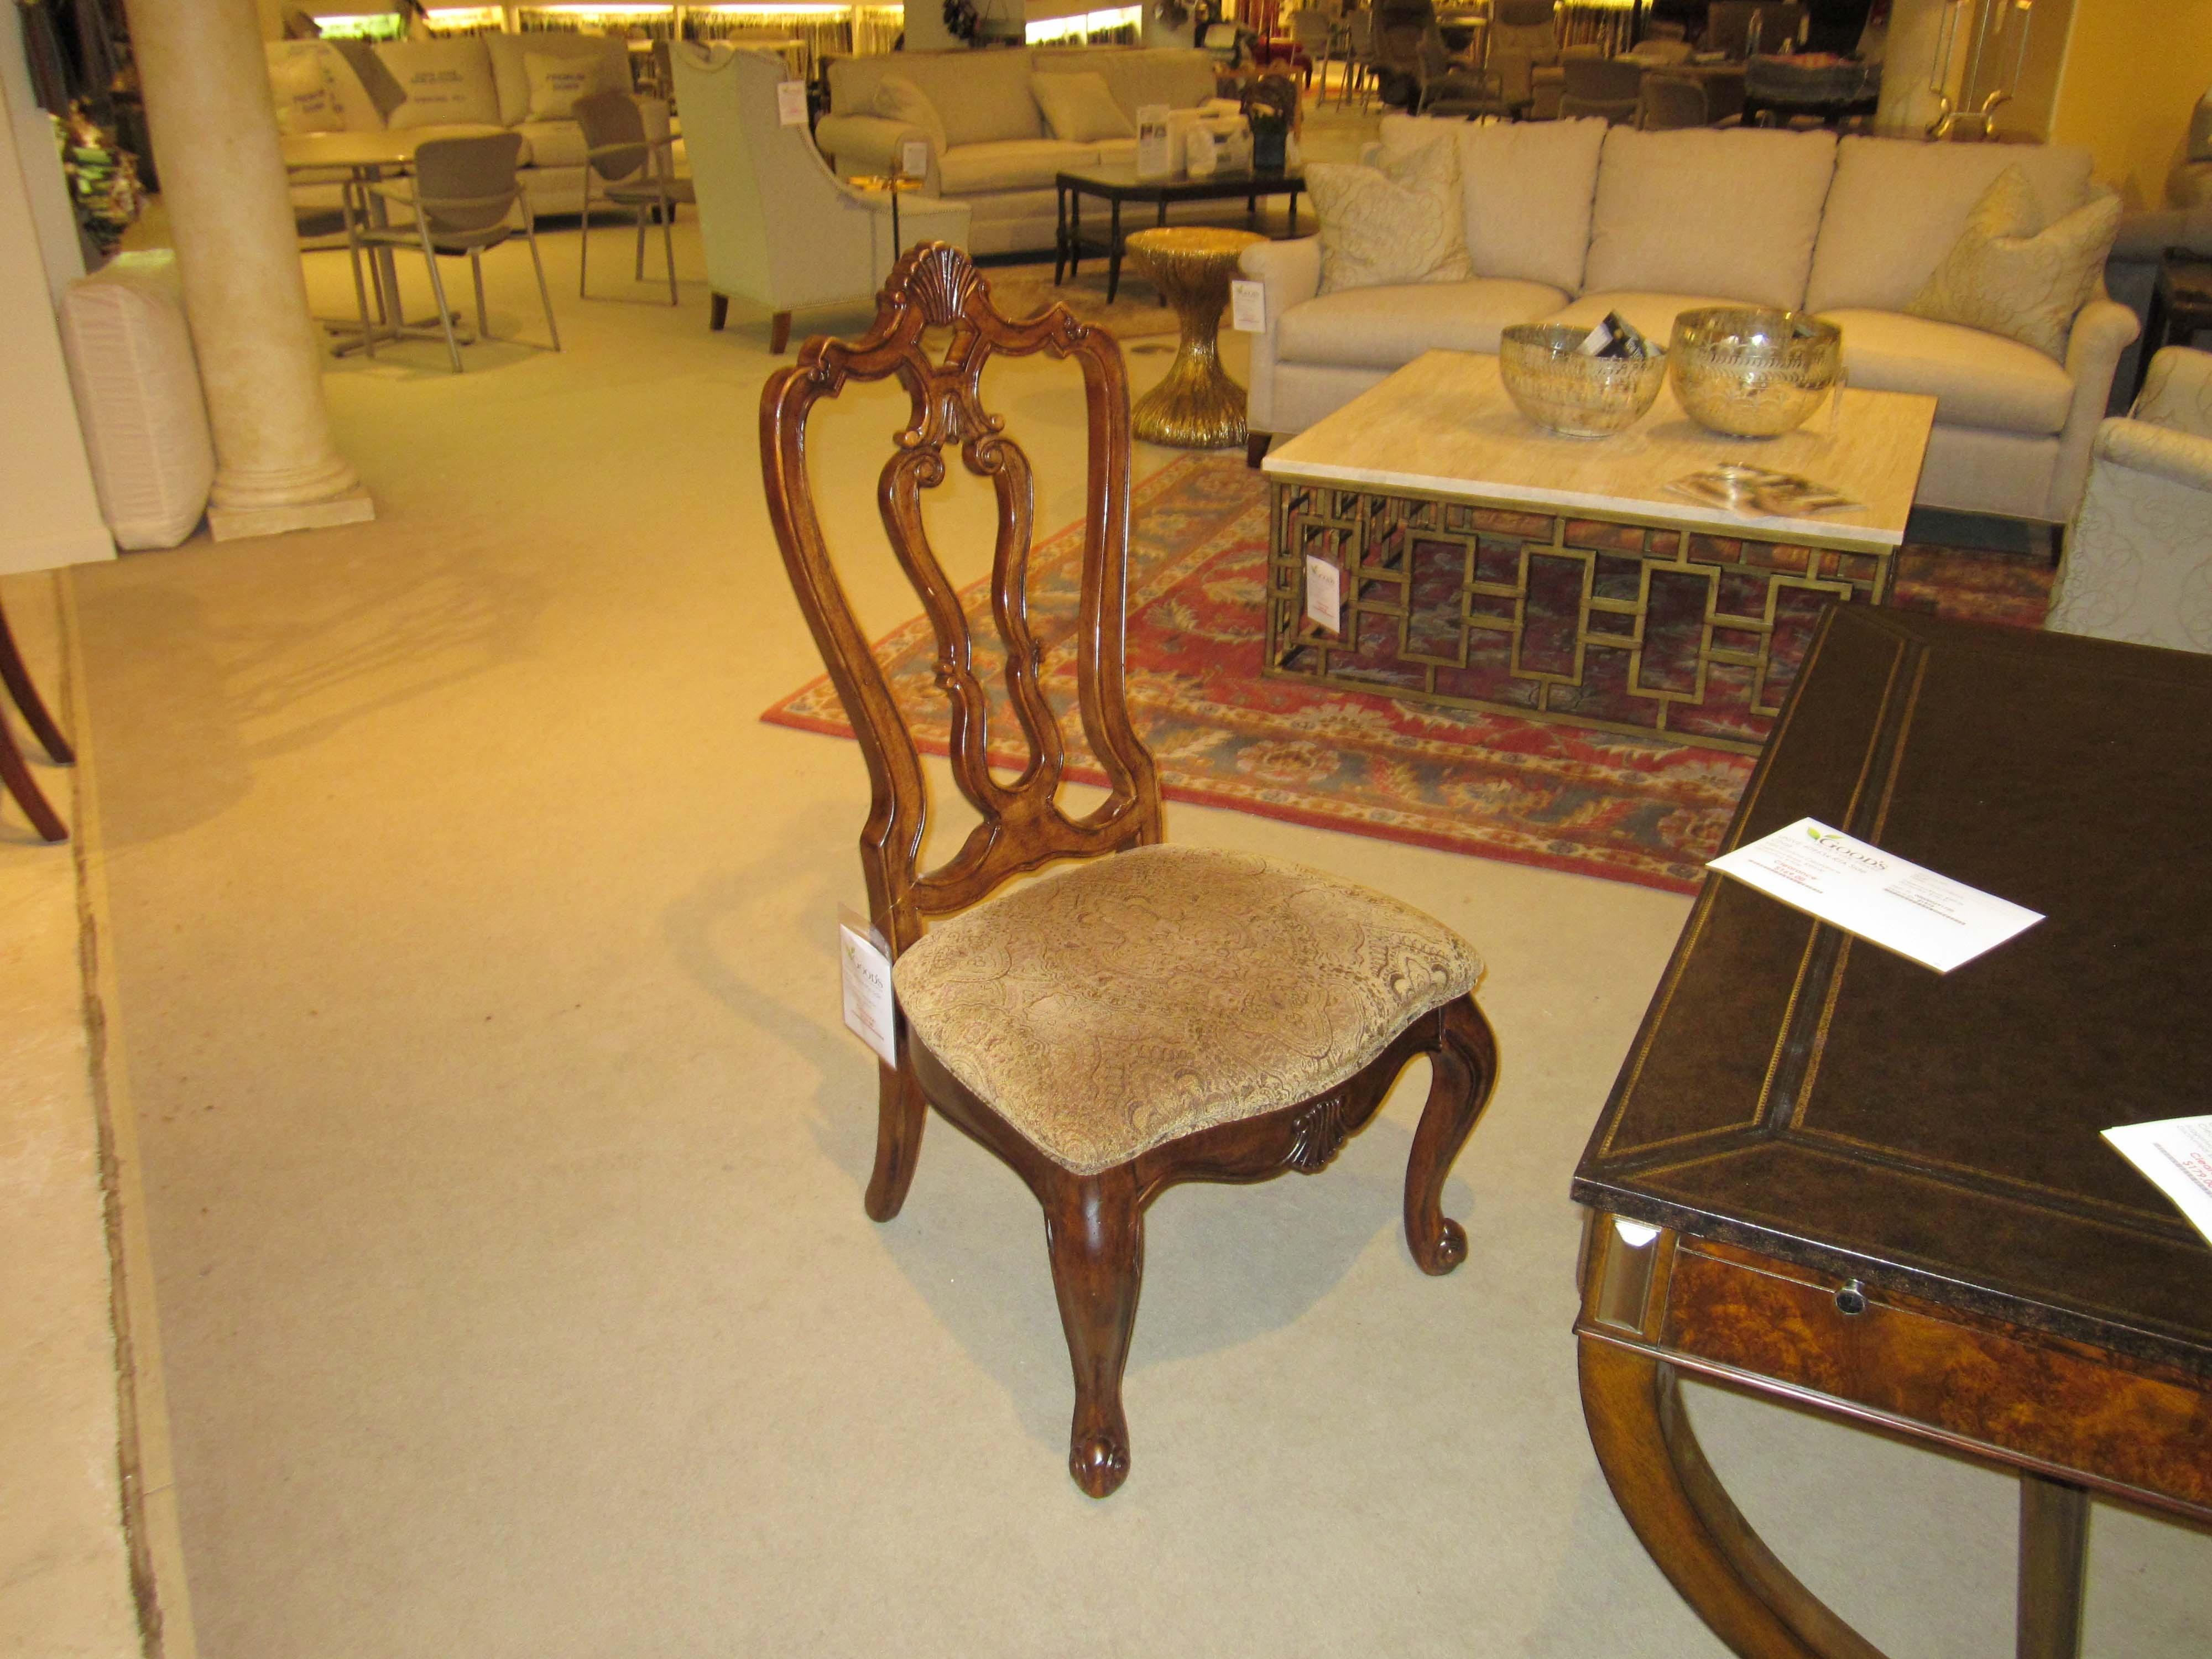 Villa Cortina Bedroom Furniture: Universal Furniture 409634-RTA-Clearance Dining Room Villa